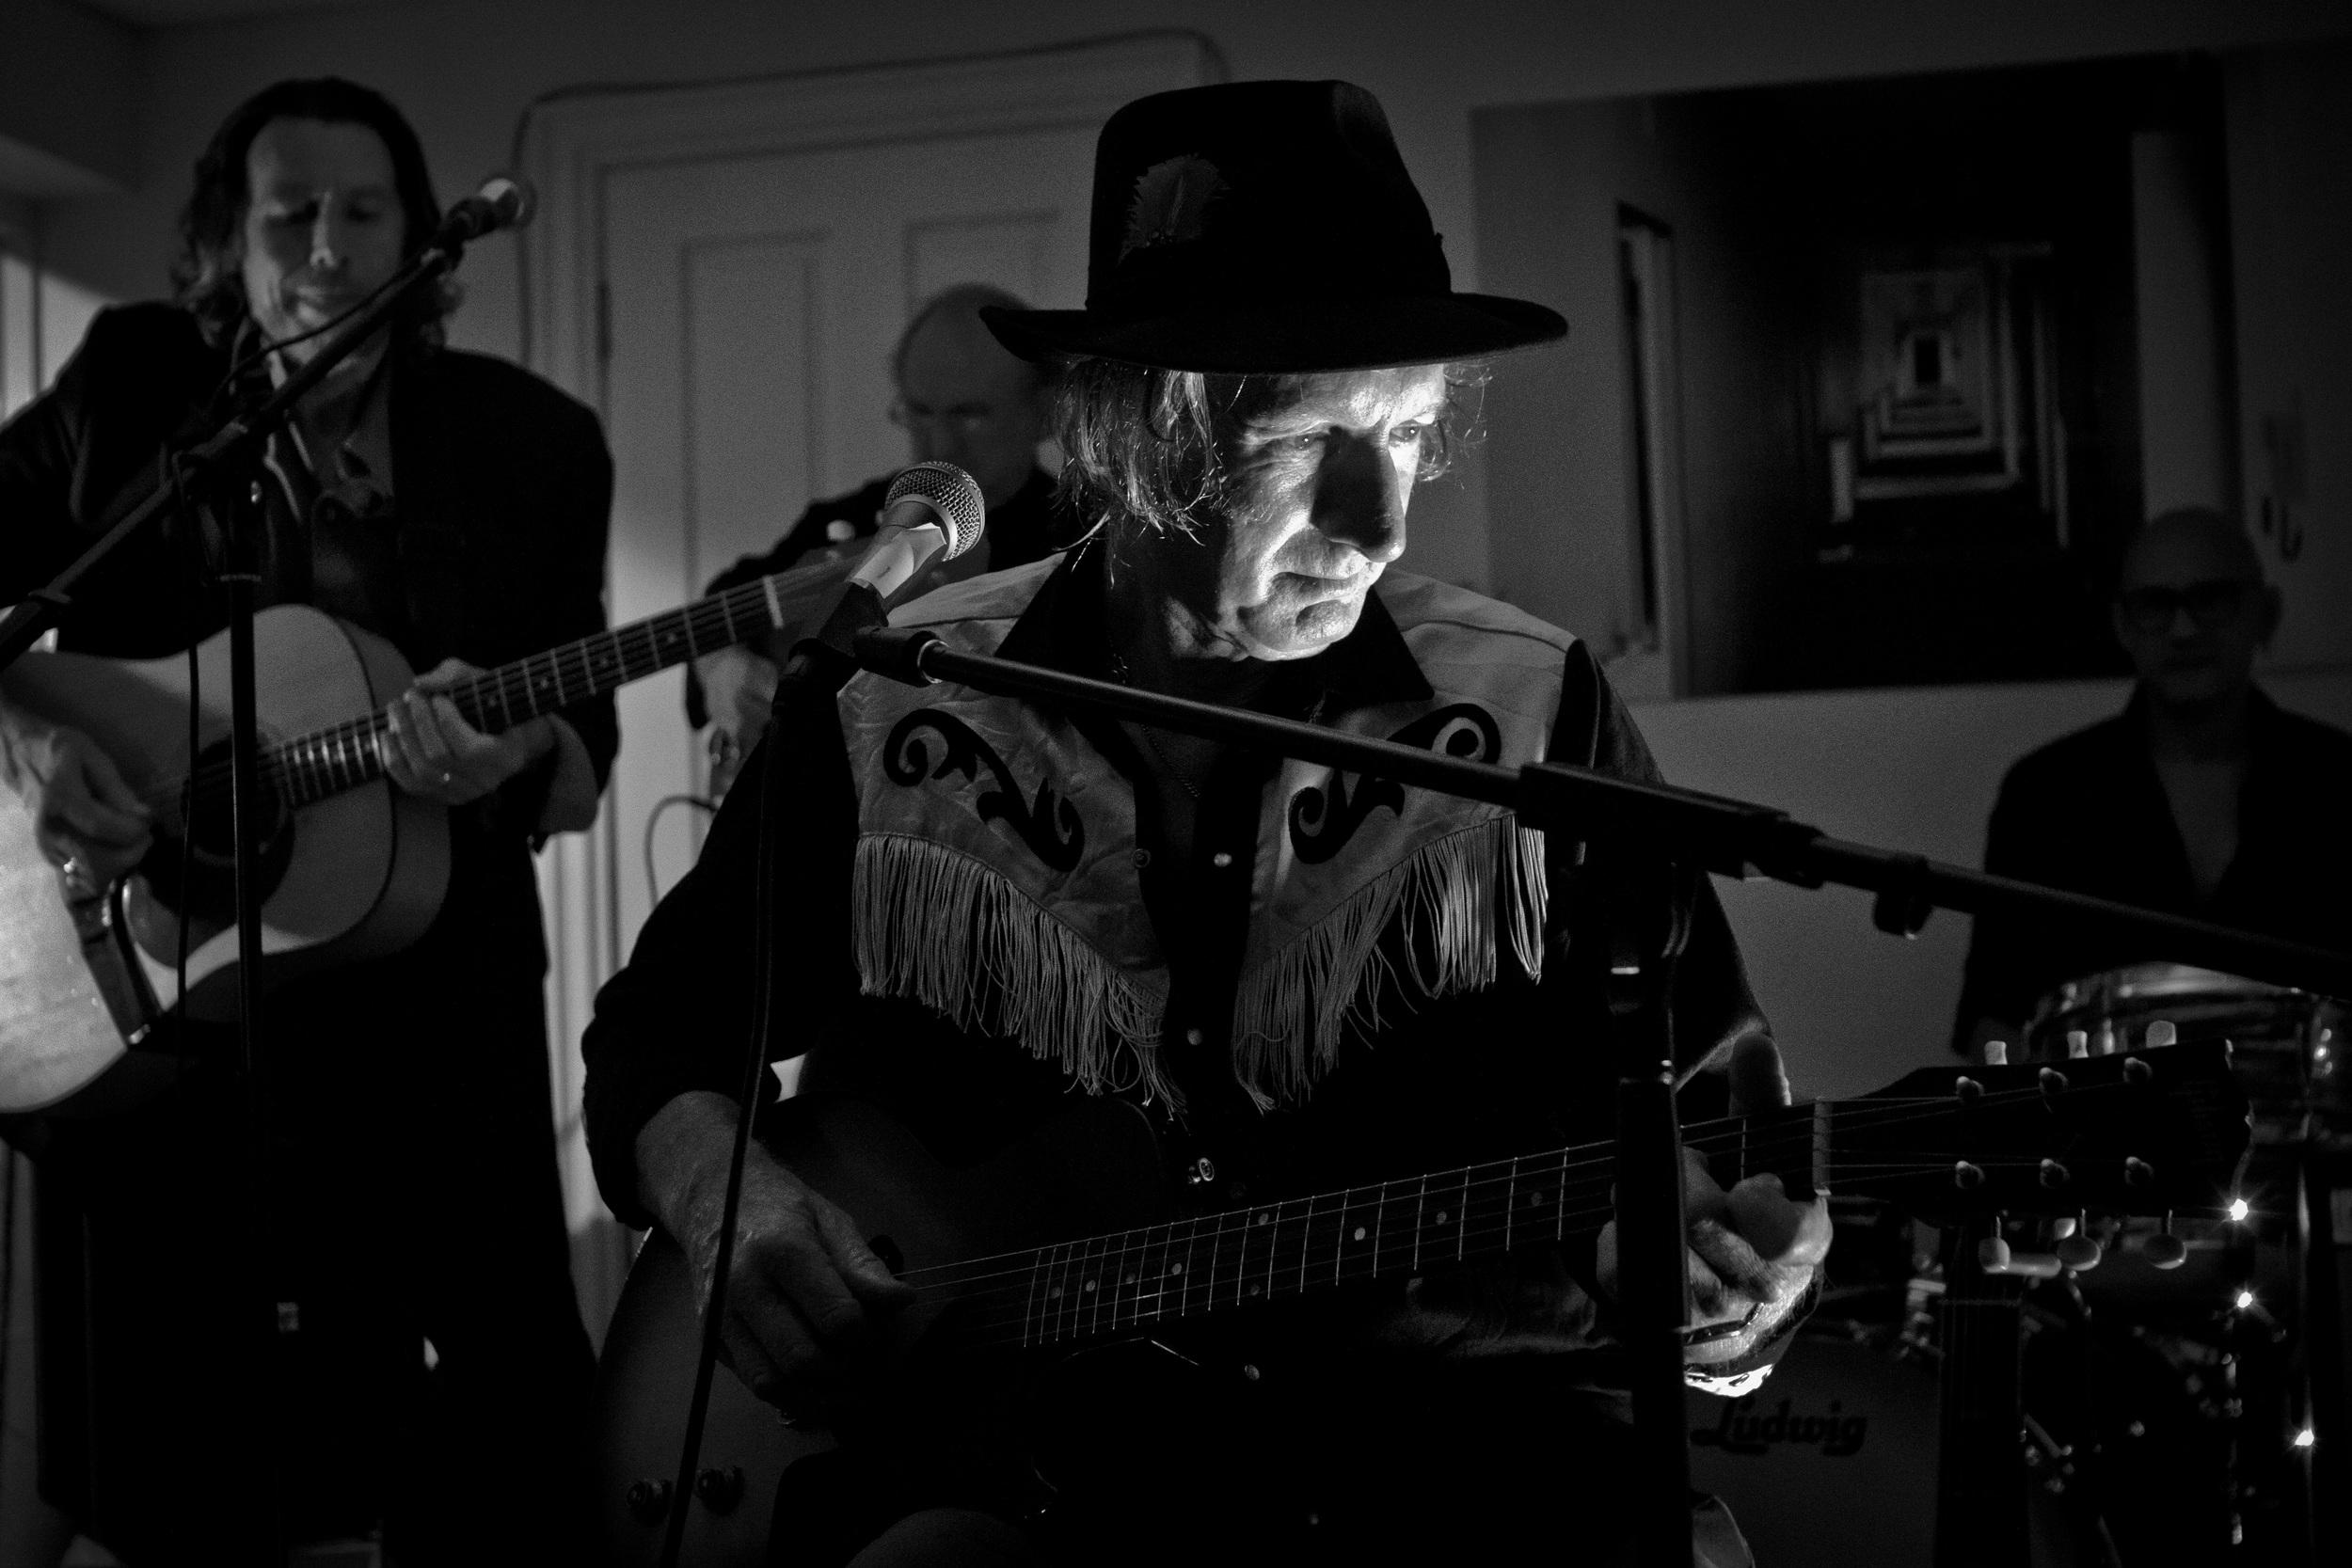 Live in Darlington (March 2013)